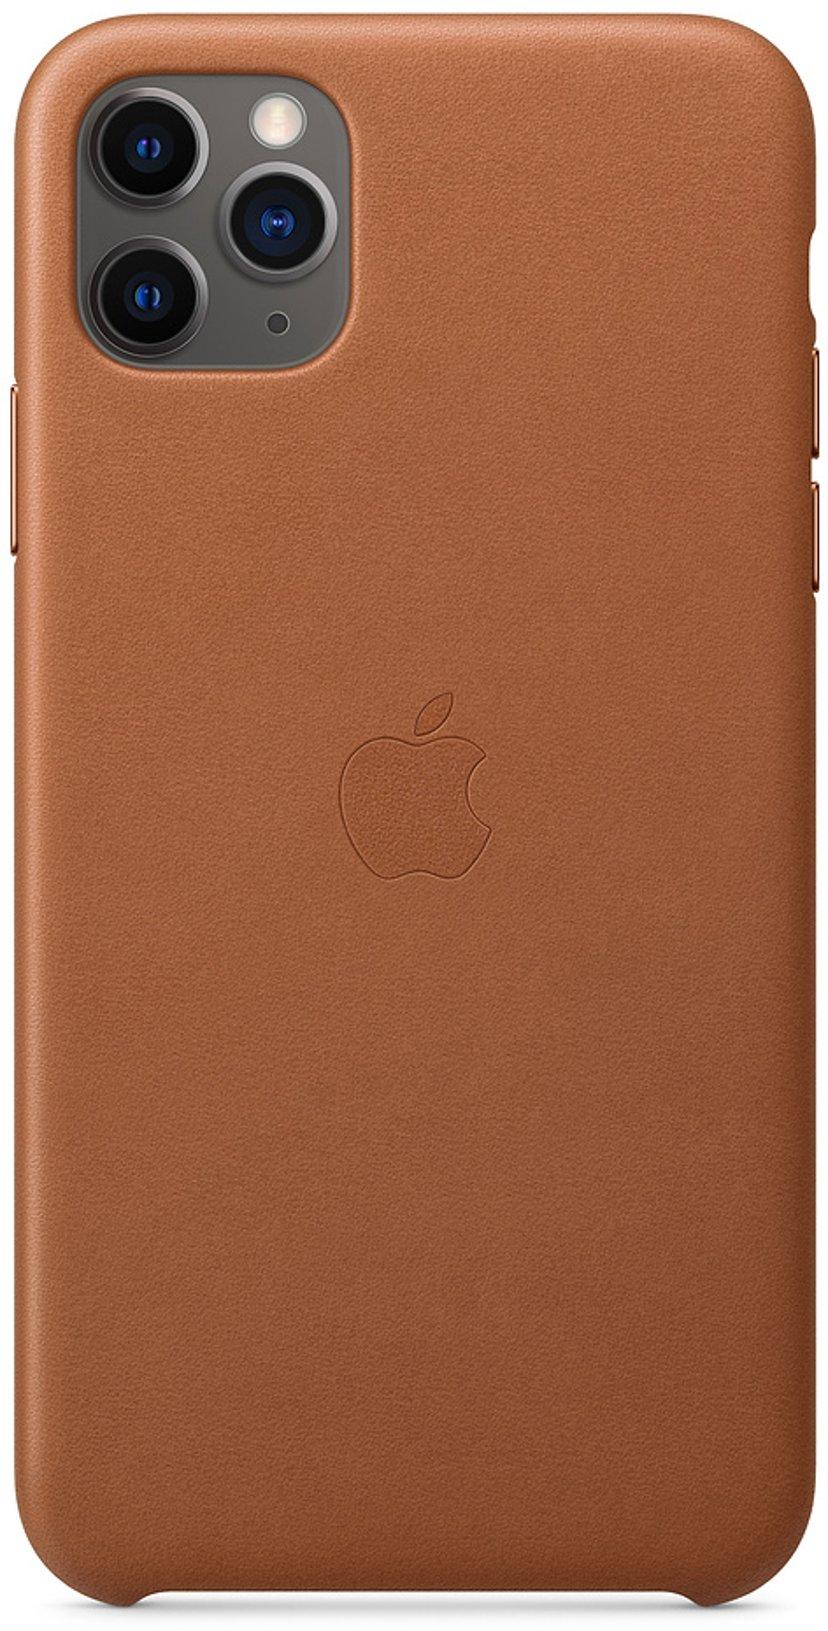 Apple Baksidedeksel for mobiltelefon iPhone 11 Pro Max Salbrun